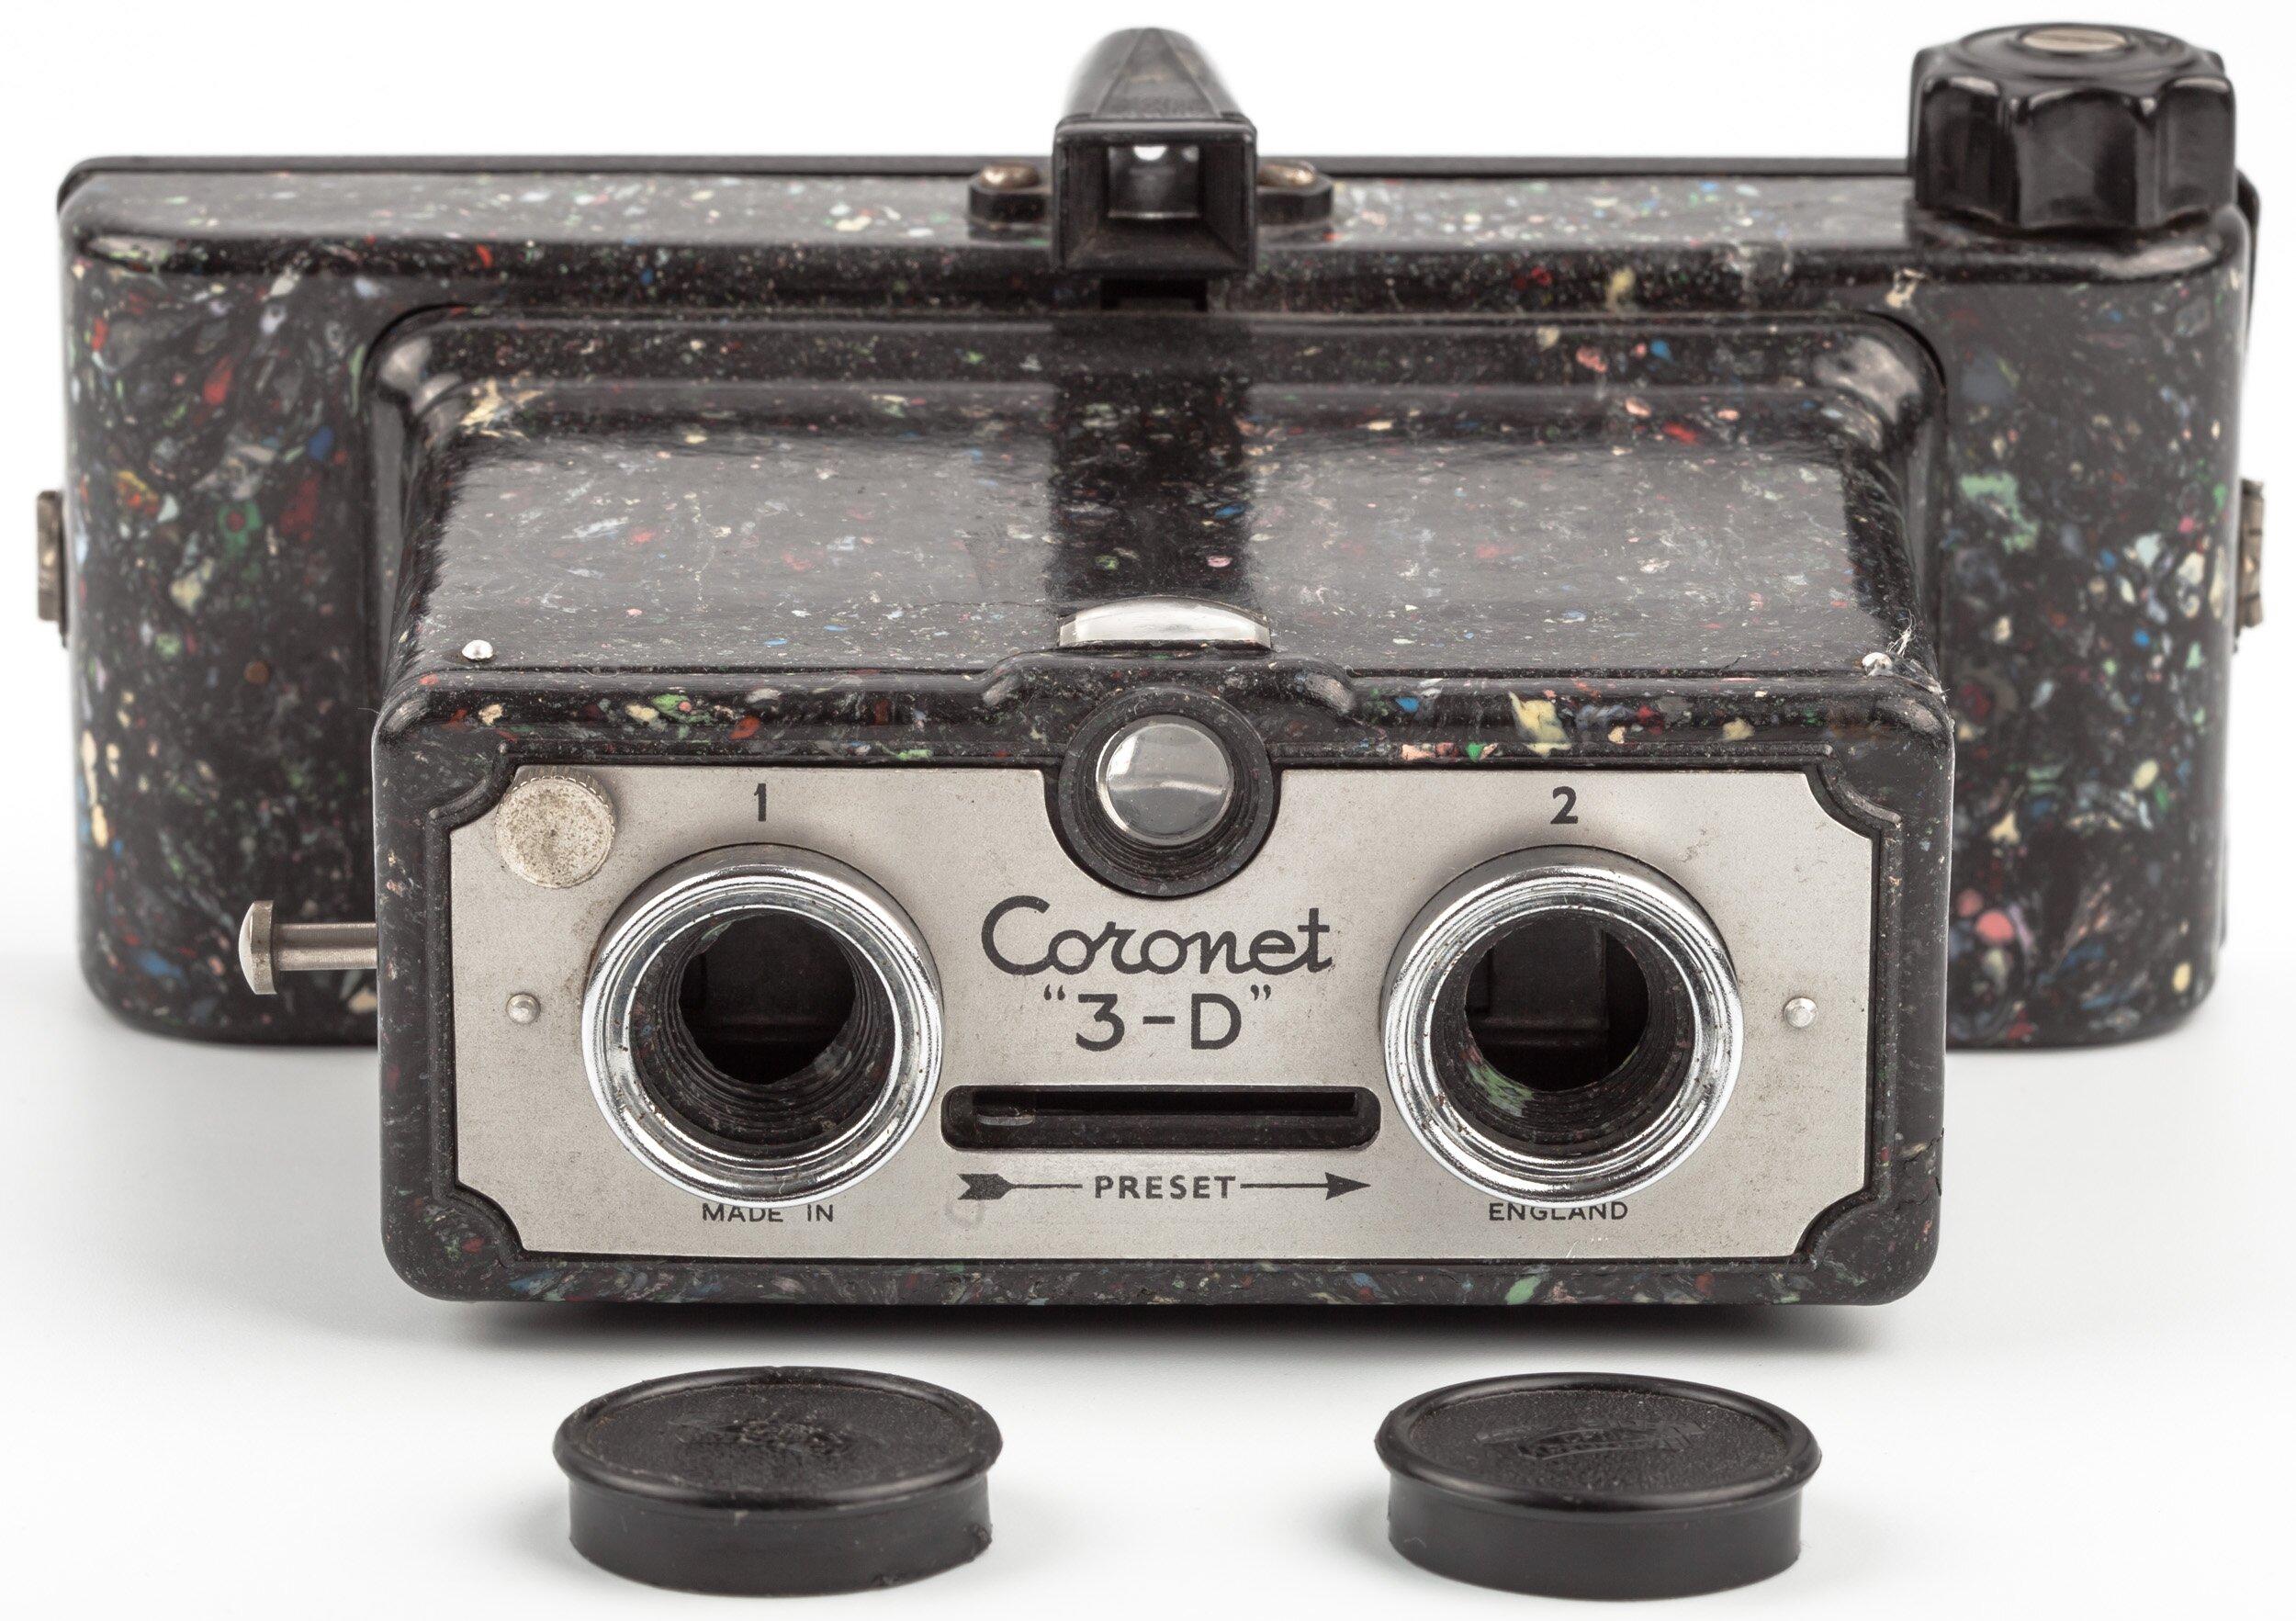 Coronet 3-D Kamera